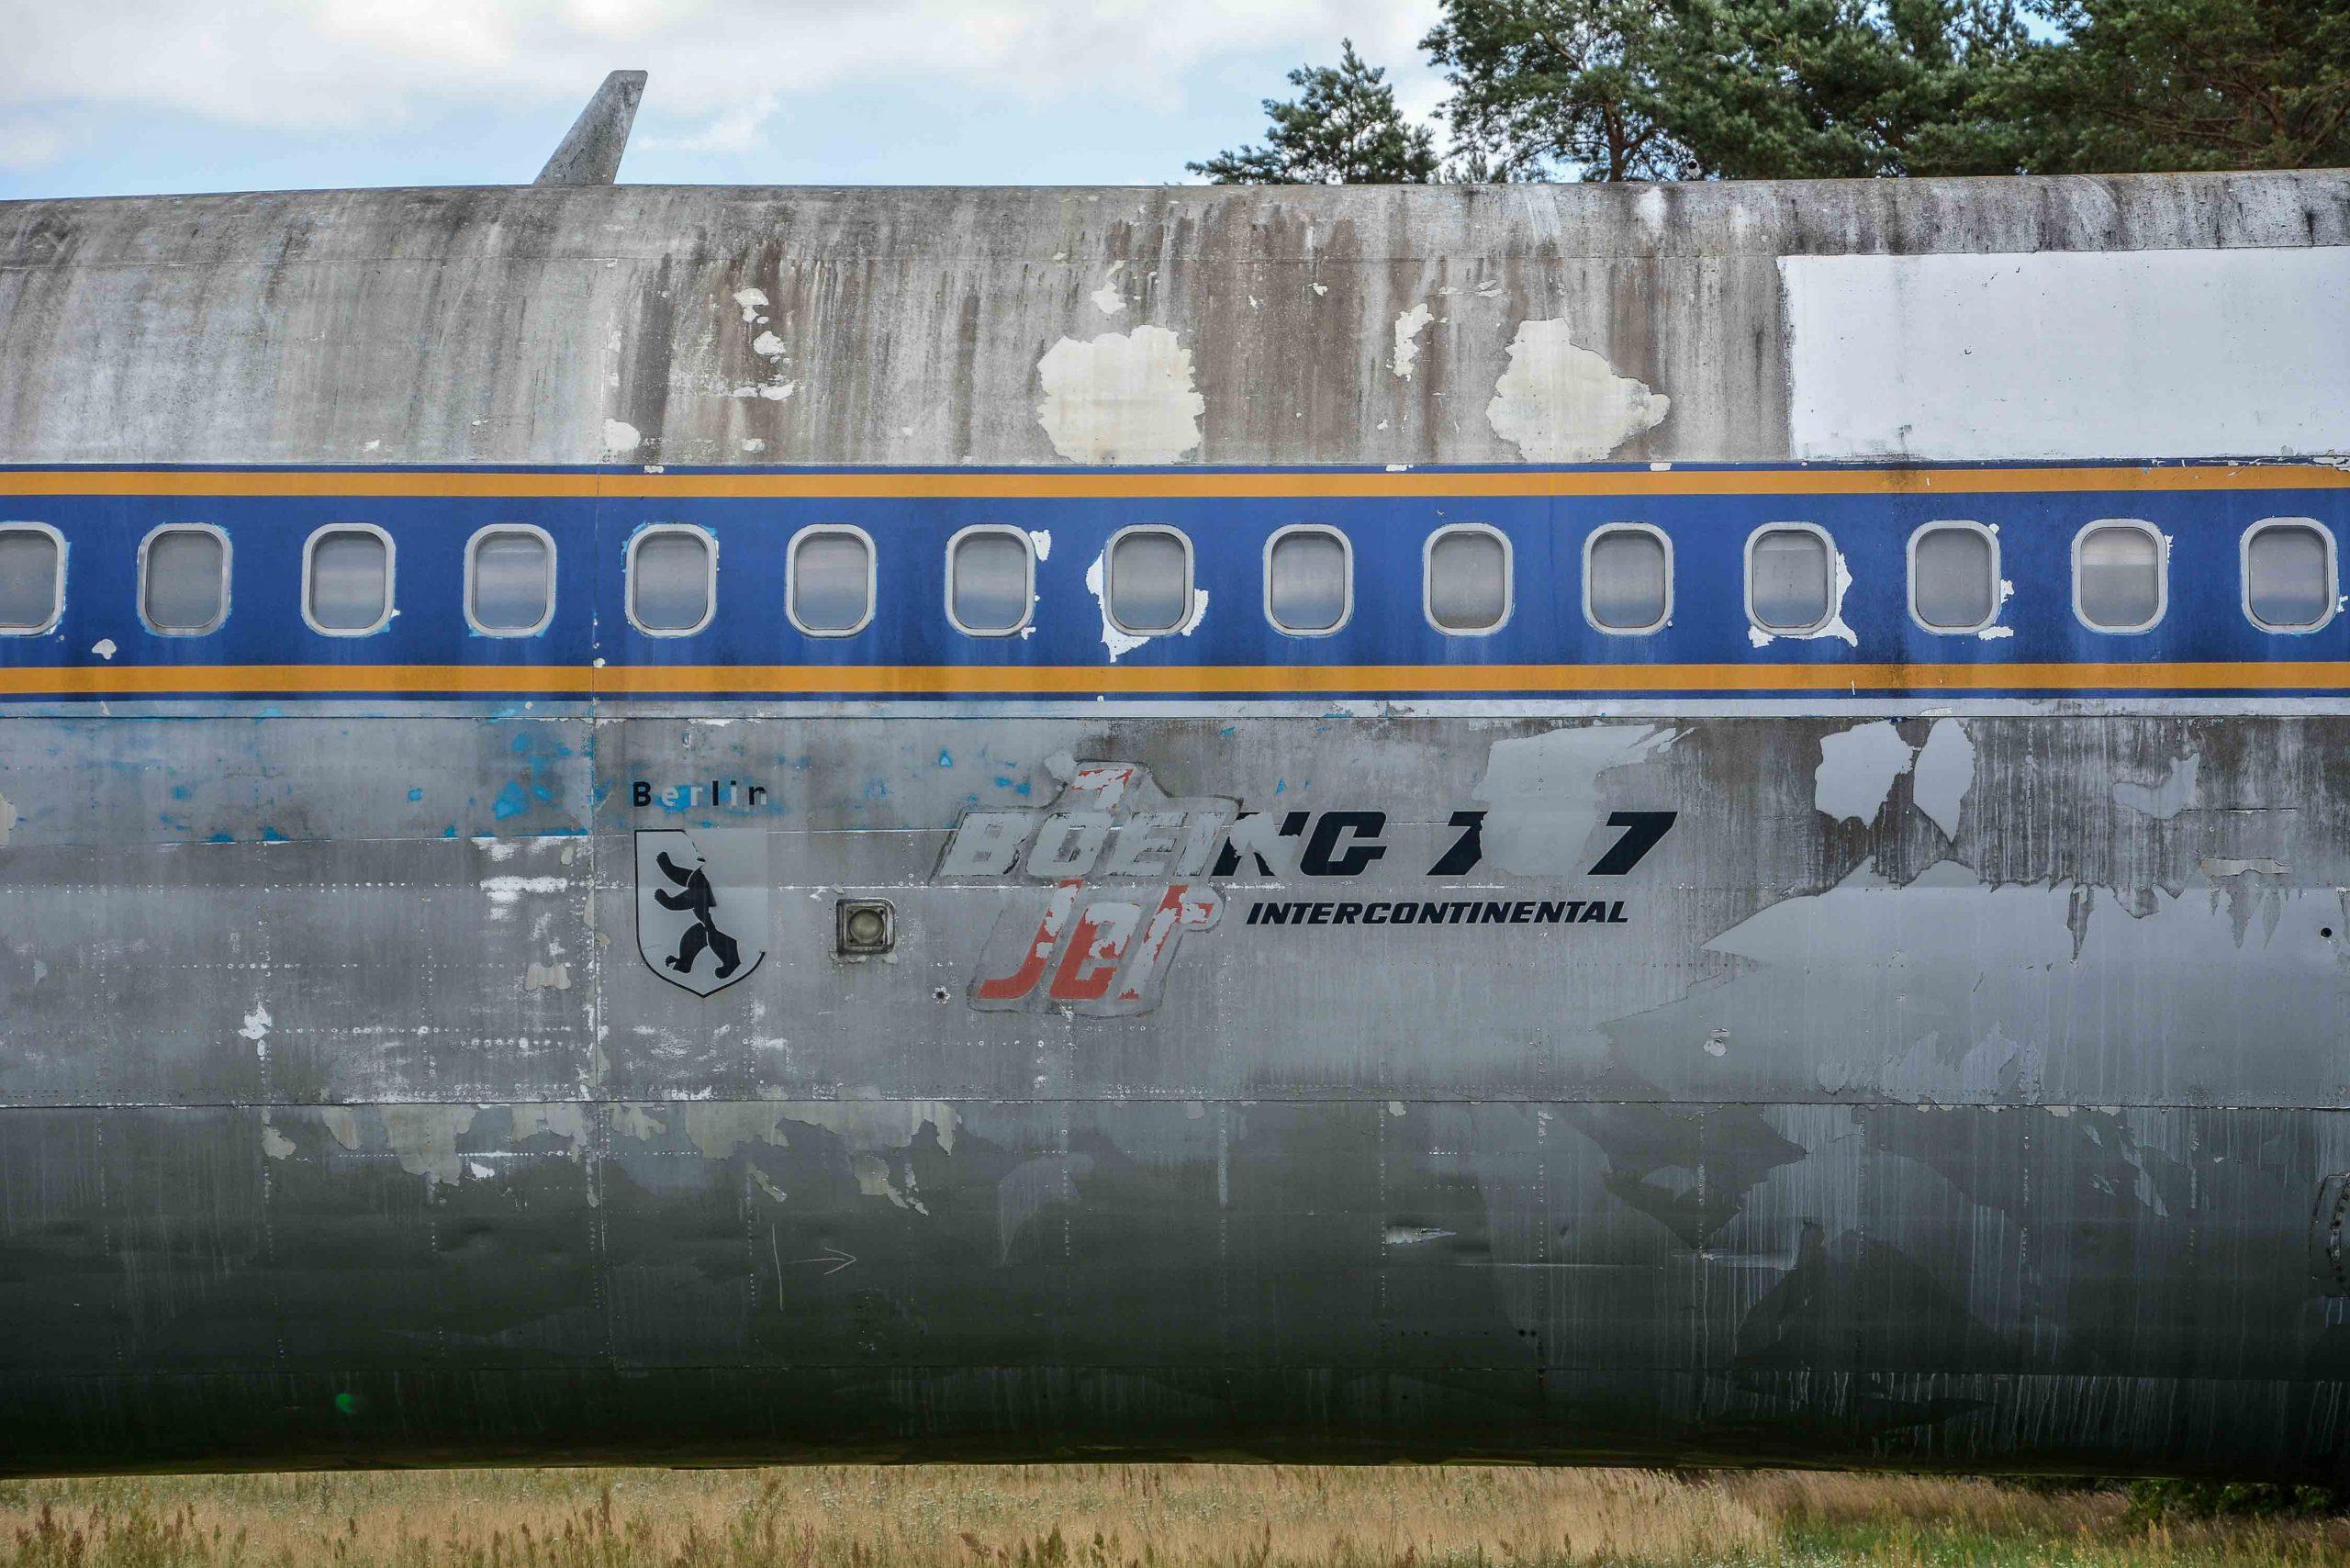 abandoned boeing 707 aircraft airplane livery tegel txl flughafen airport berlin germany deutschland